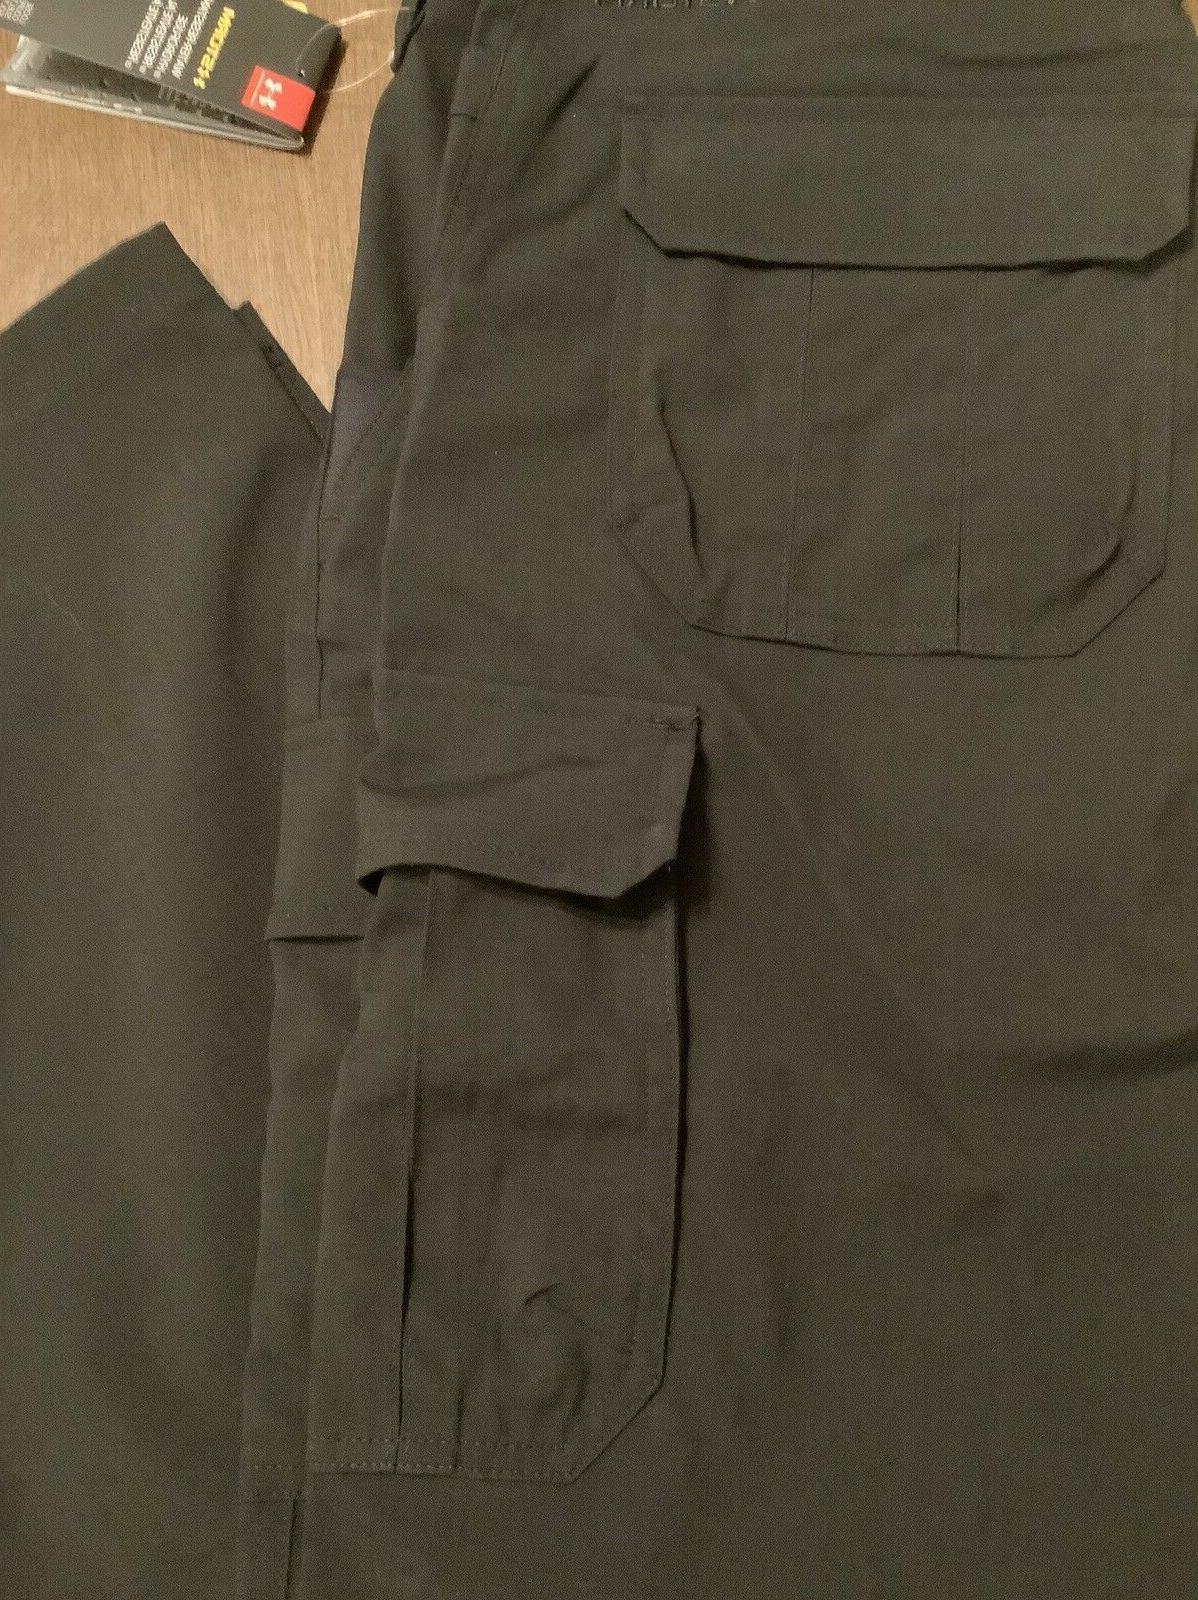 Under Armour Storm Pants 1265491 Black 40x32 NWT